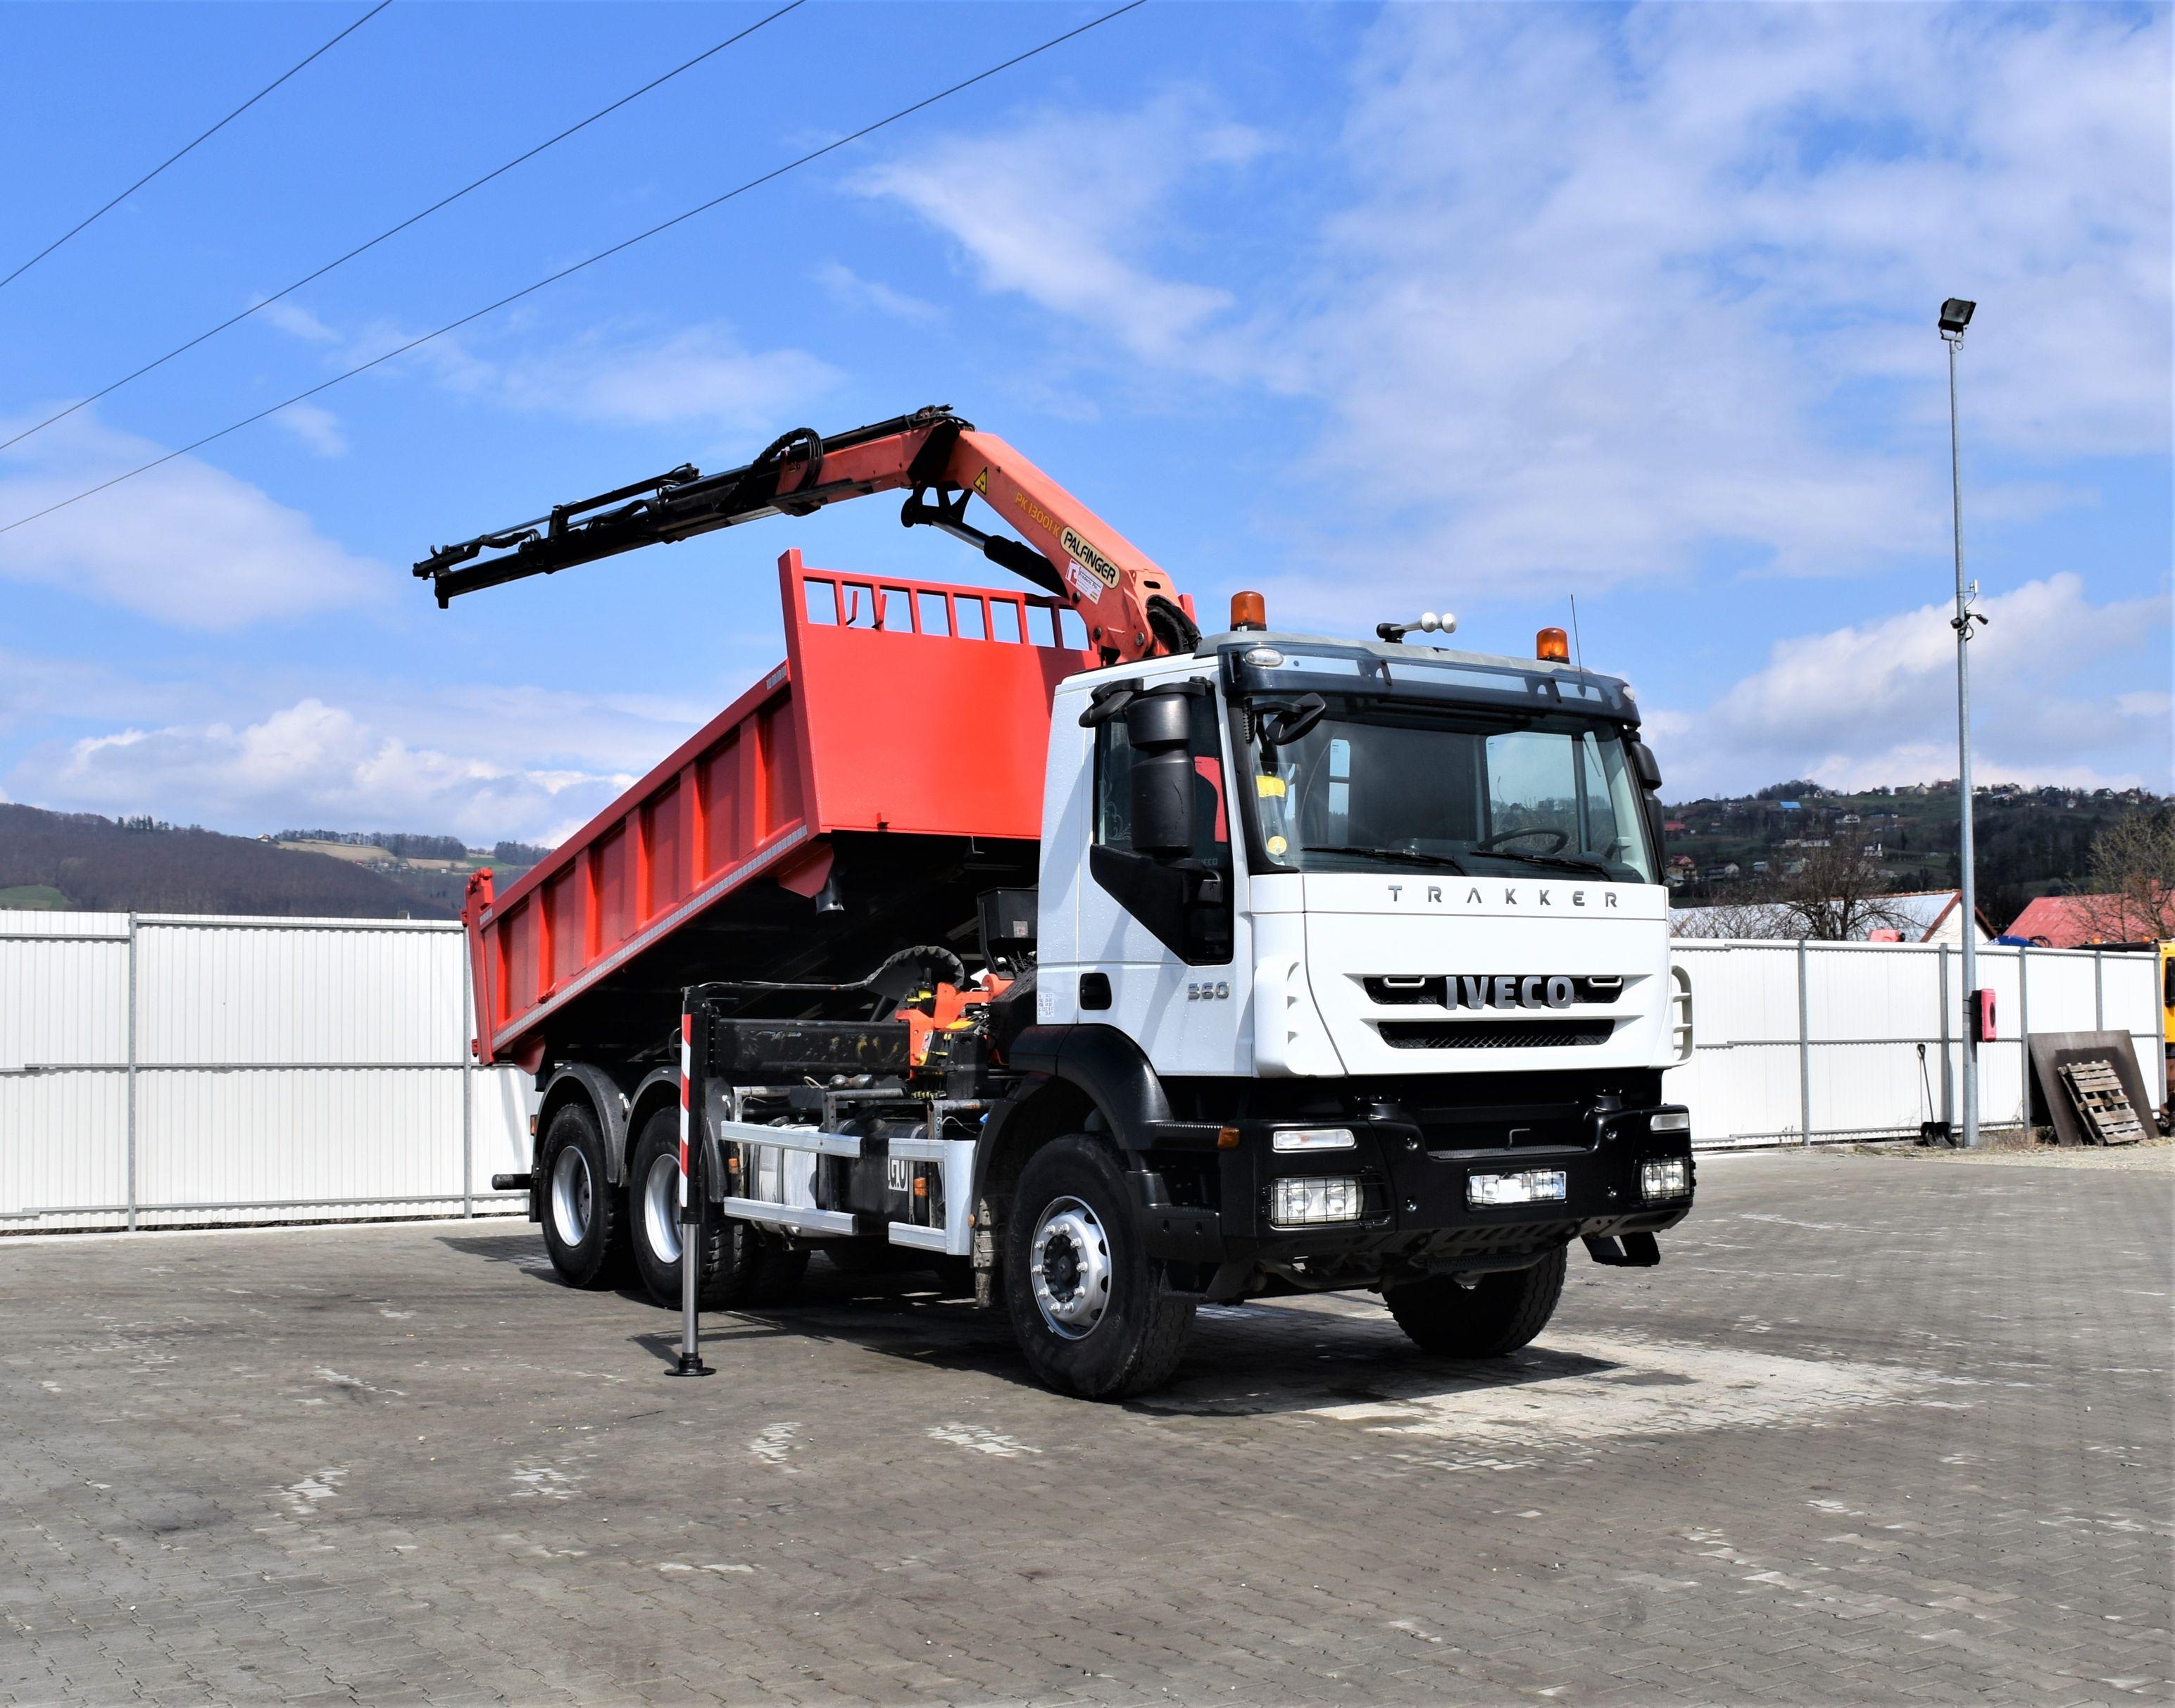 2012-iveco-trakker-360-369560-equipment-cover-image